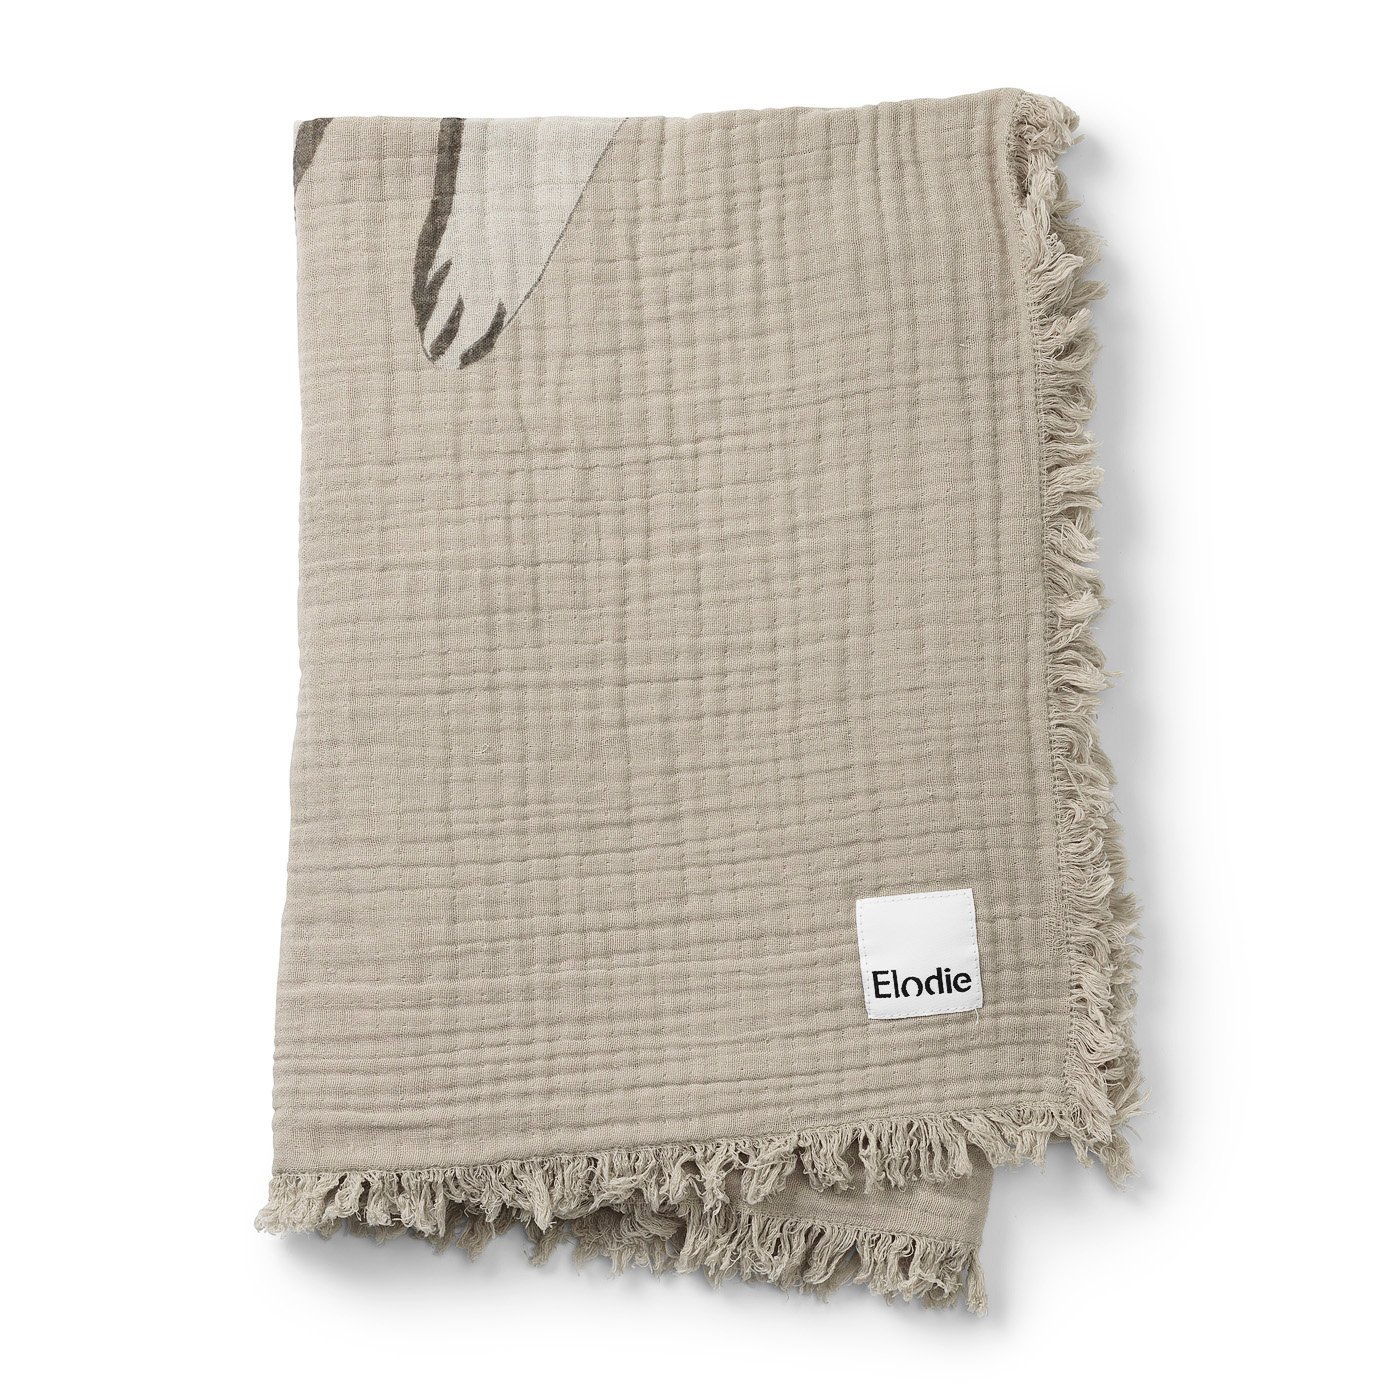 Elodie Details - Soft Cotton Blanket - Kindness Cat